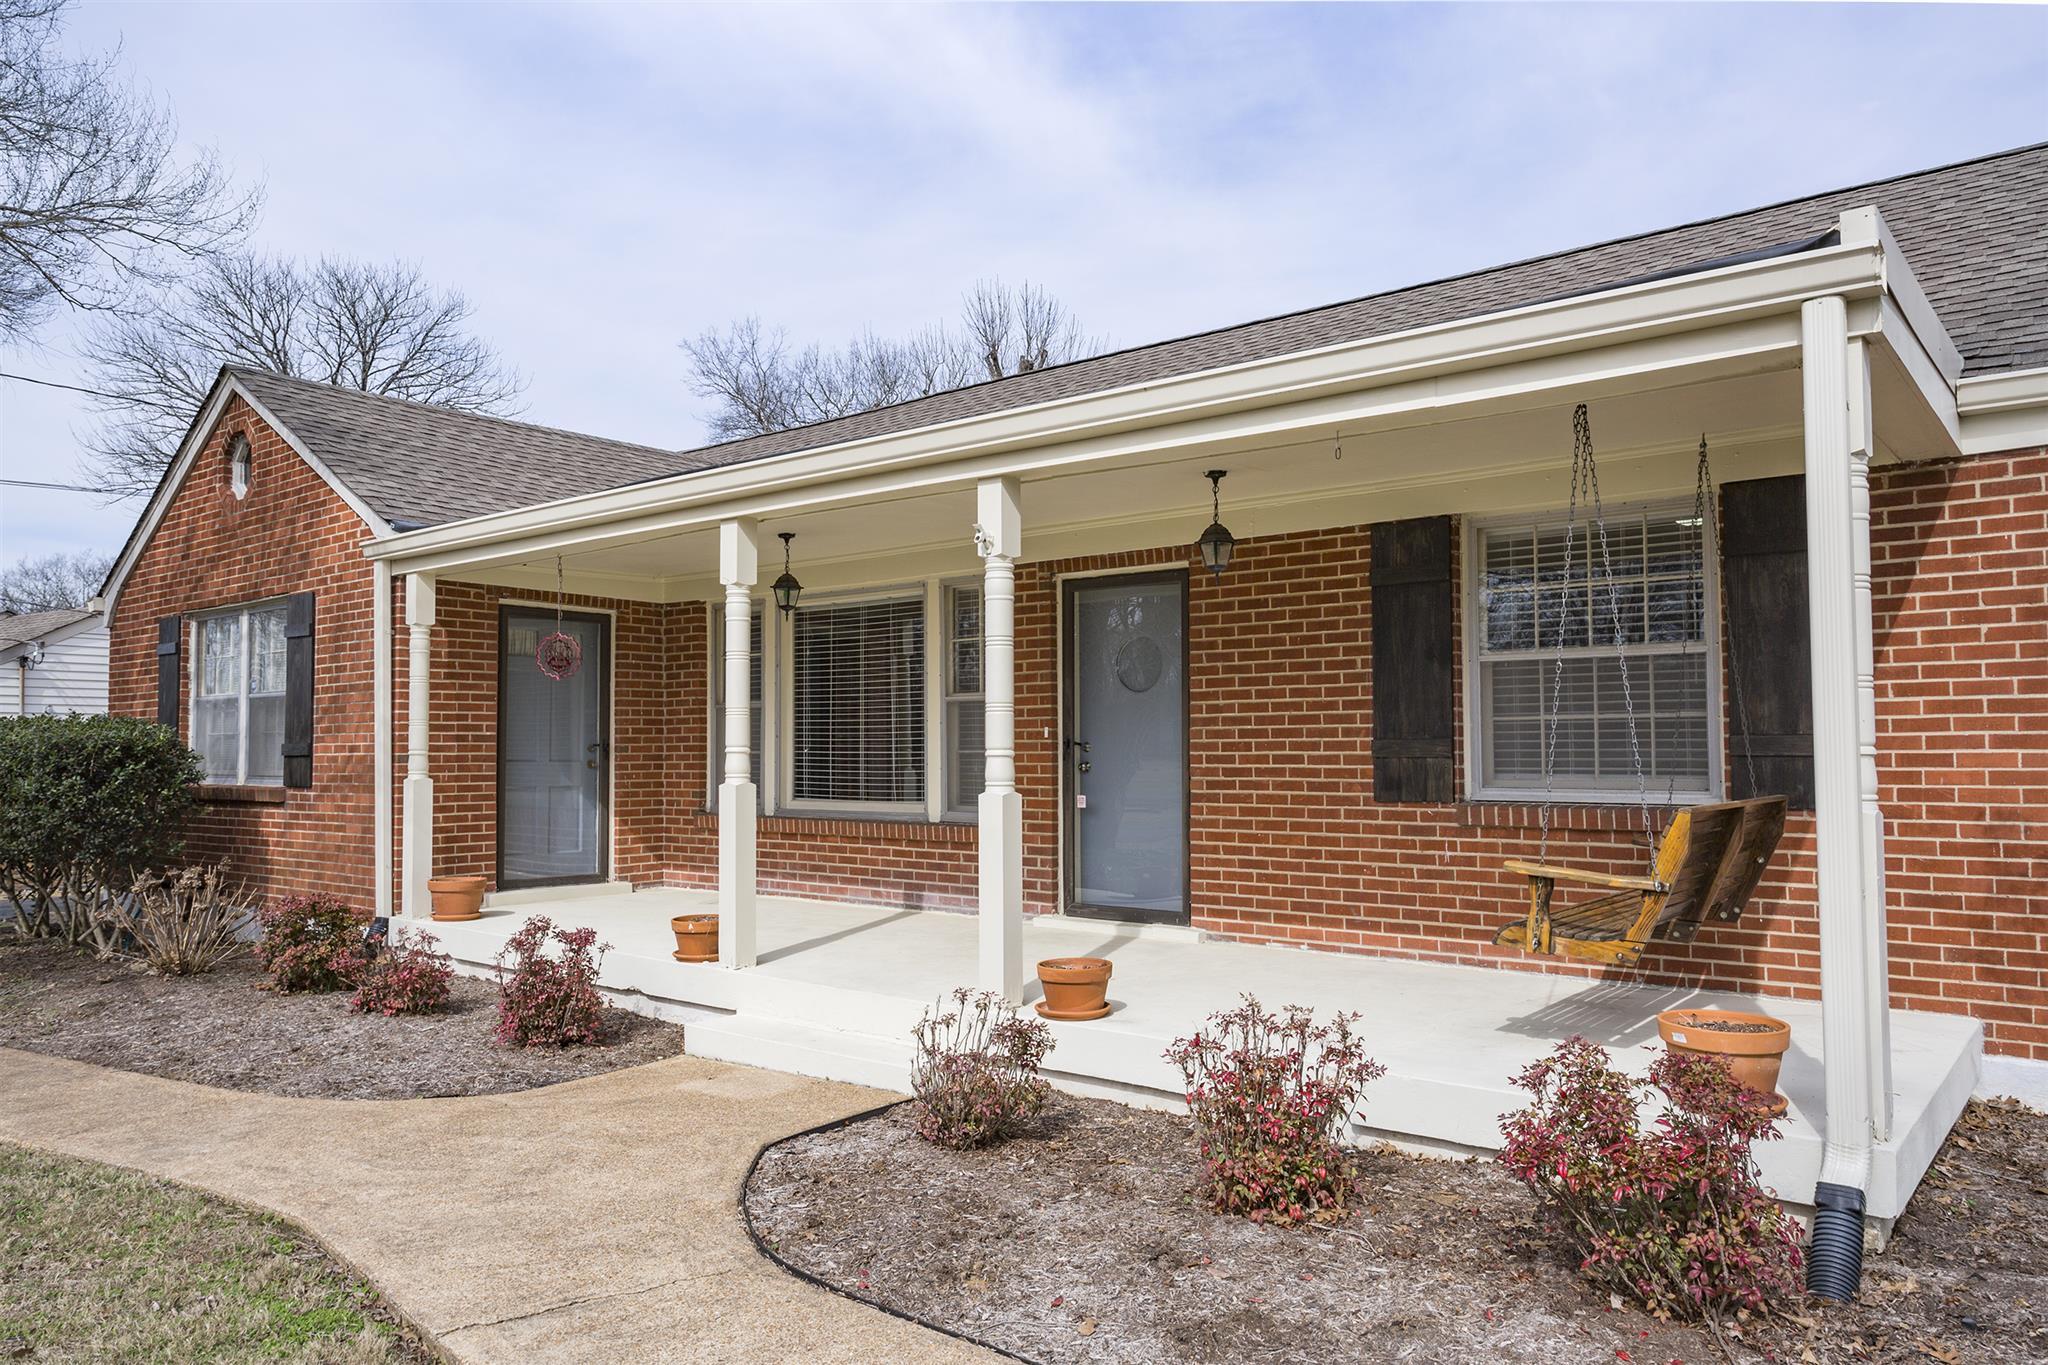 McGaughey Heights Homes For Sale Nashville TN